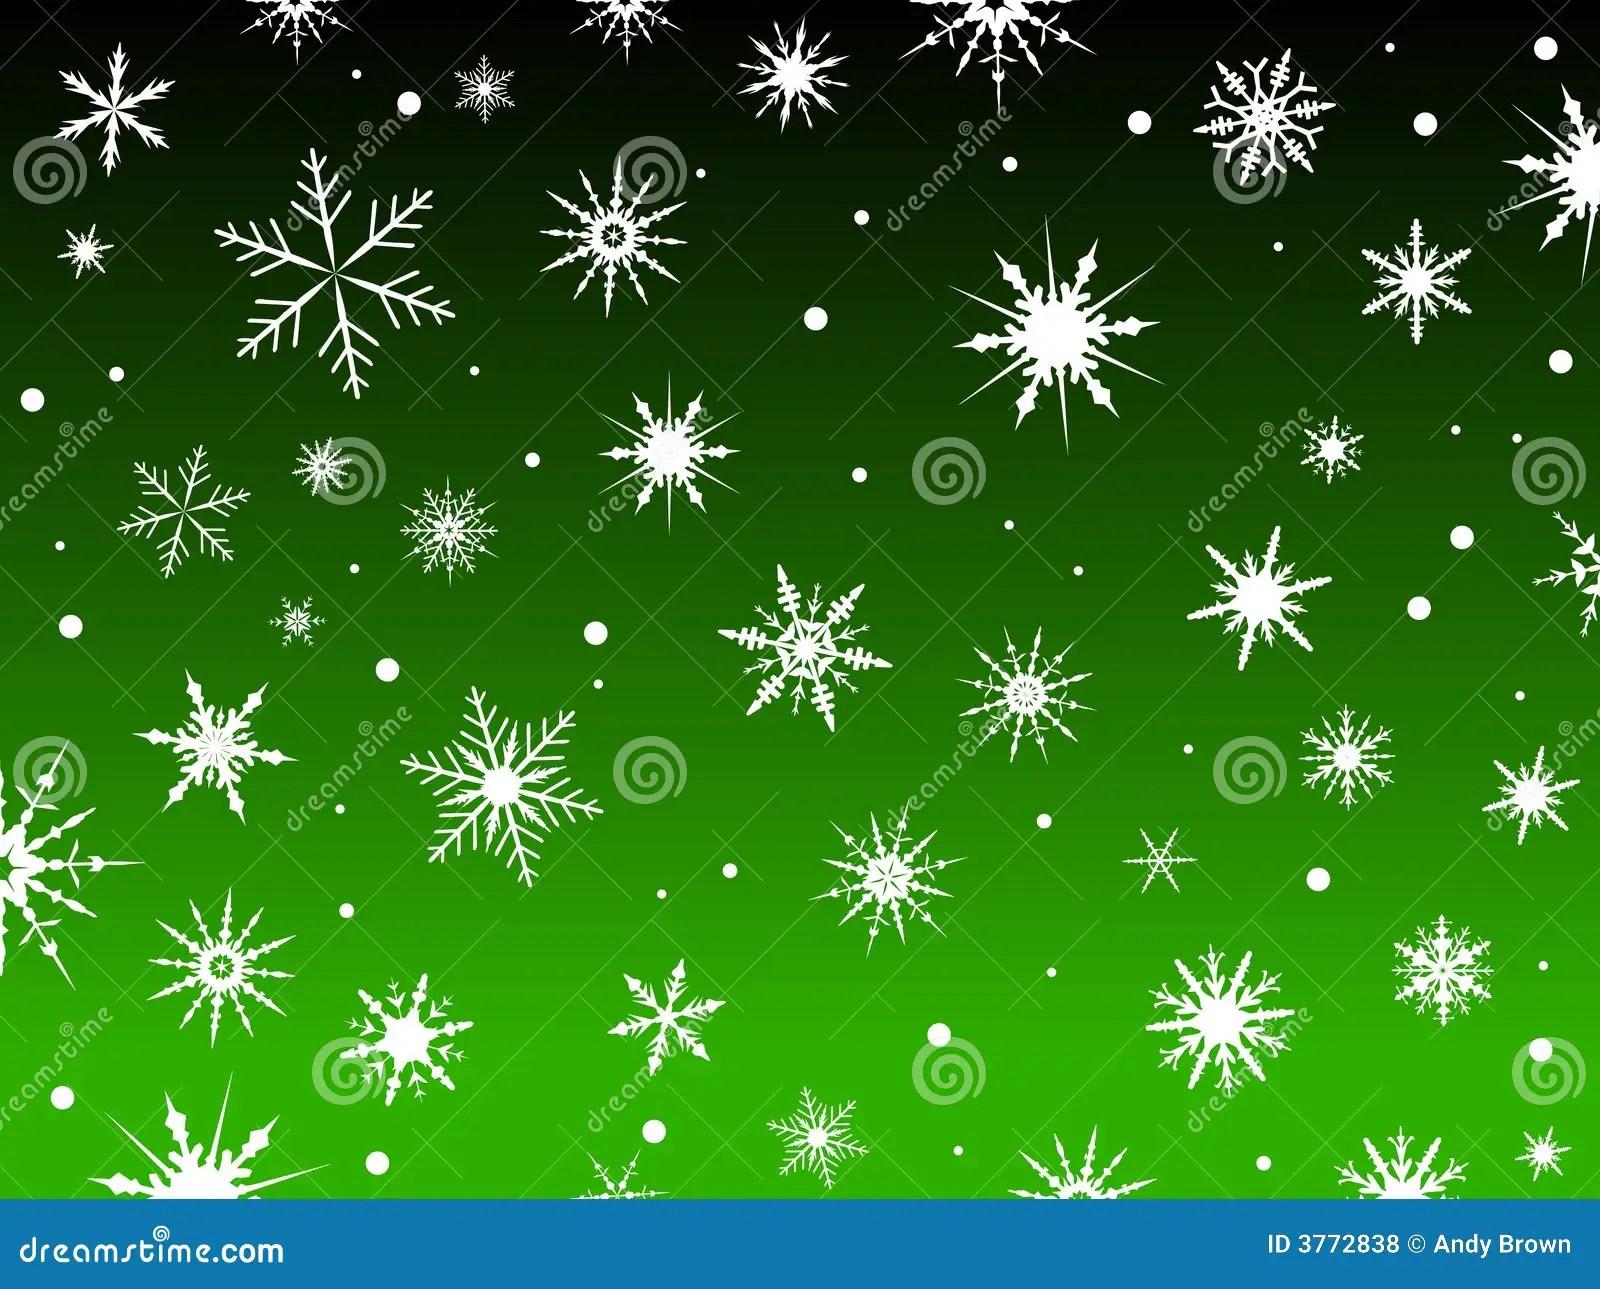 Free Falling Snow Wallpaper Snow Border Green Stock Vector Illustration Of Christmas